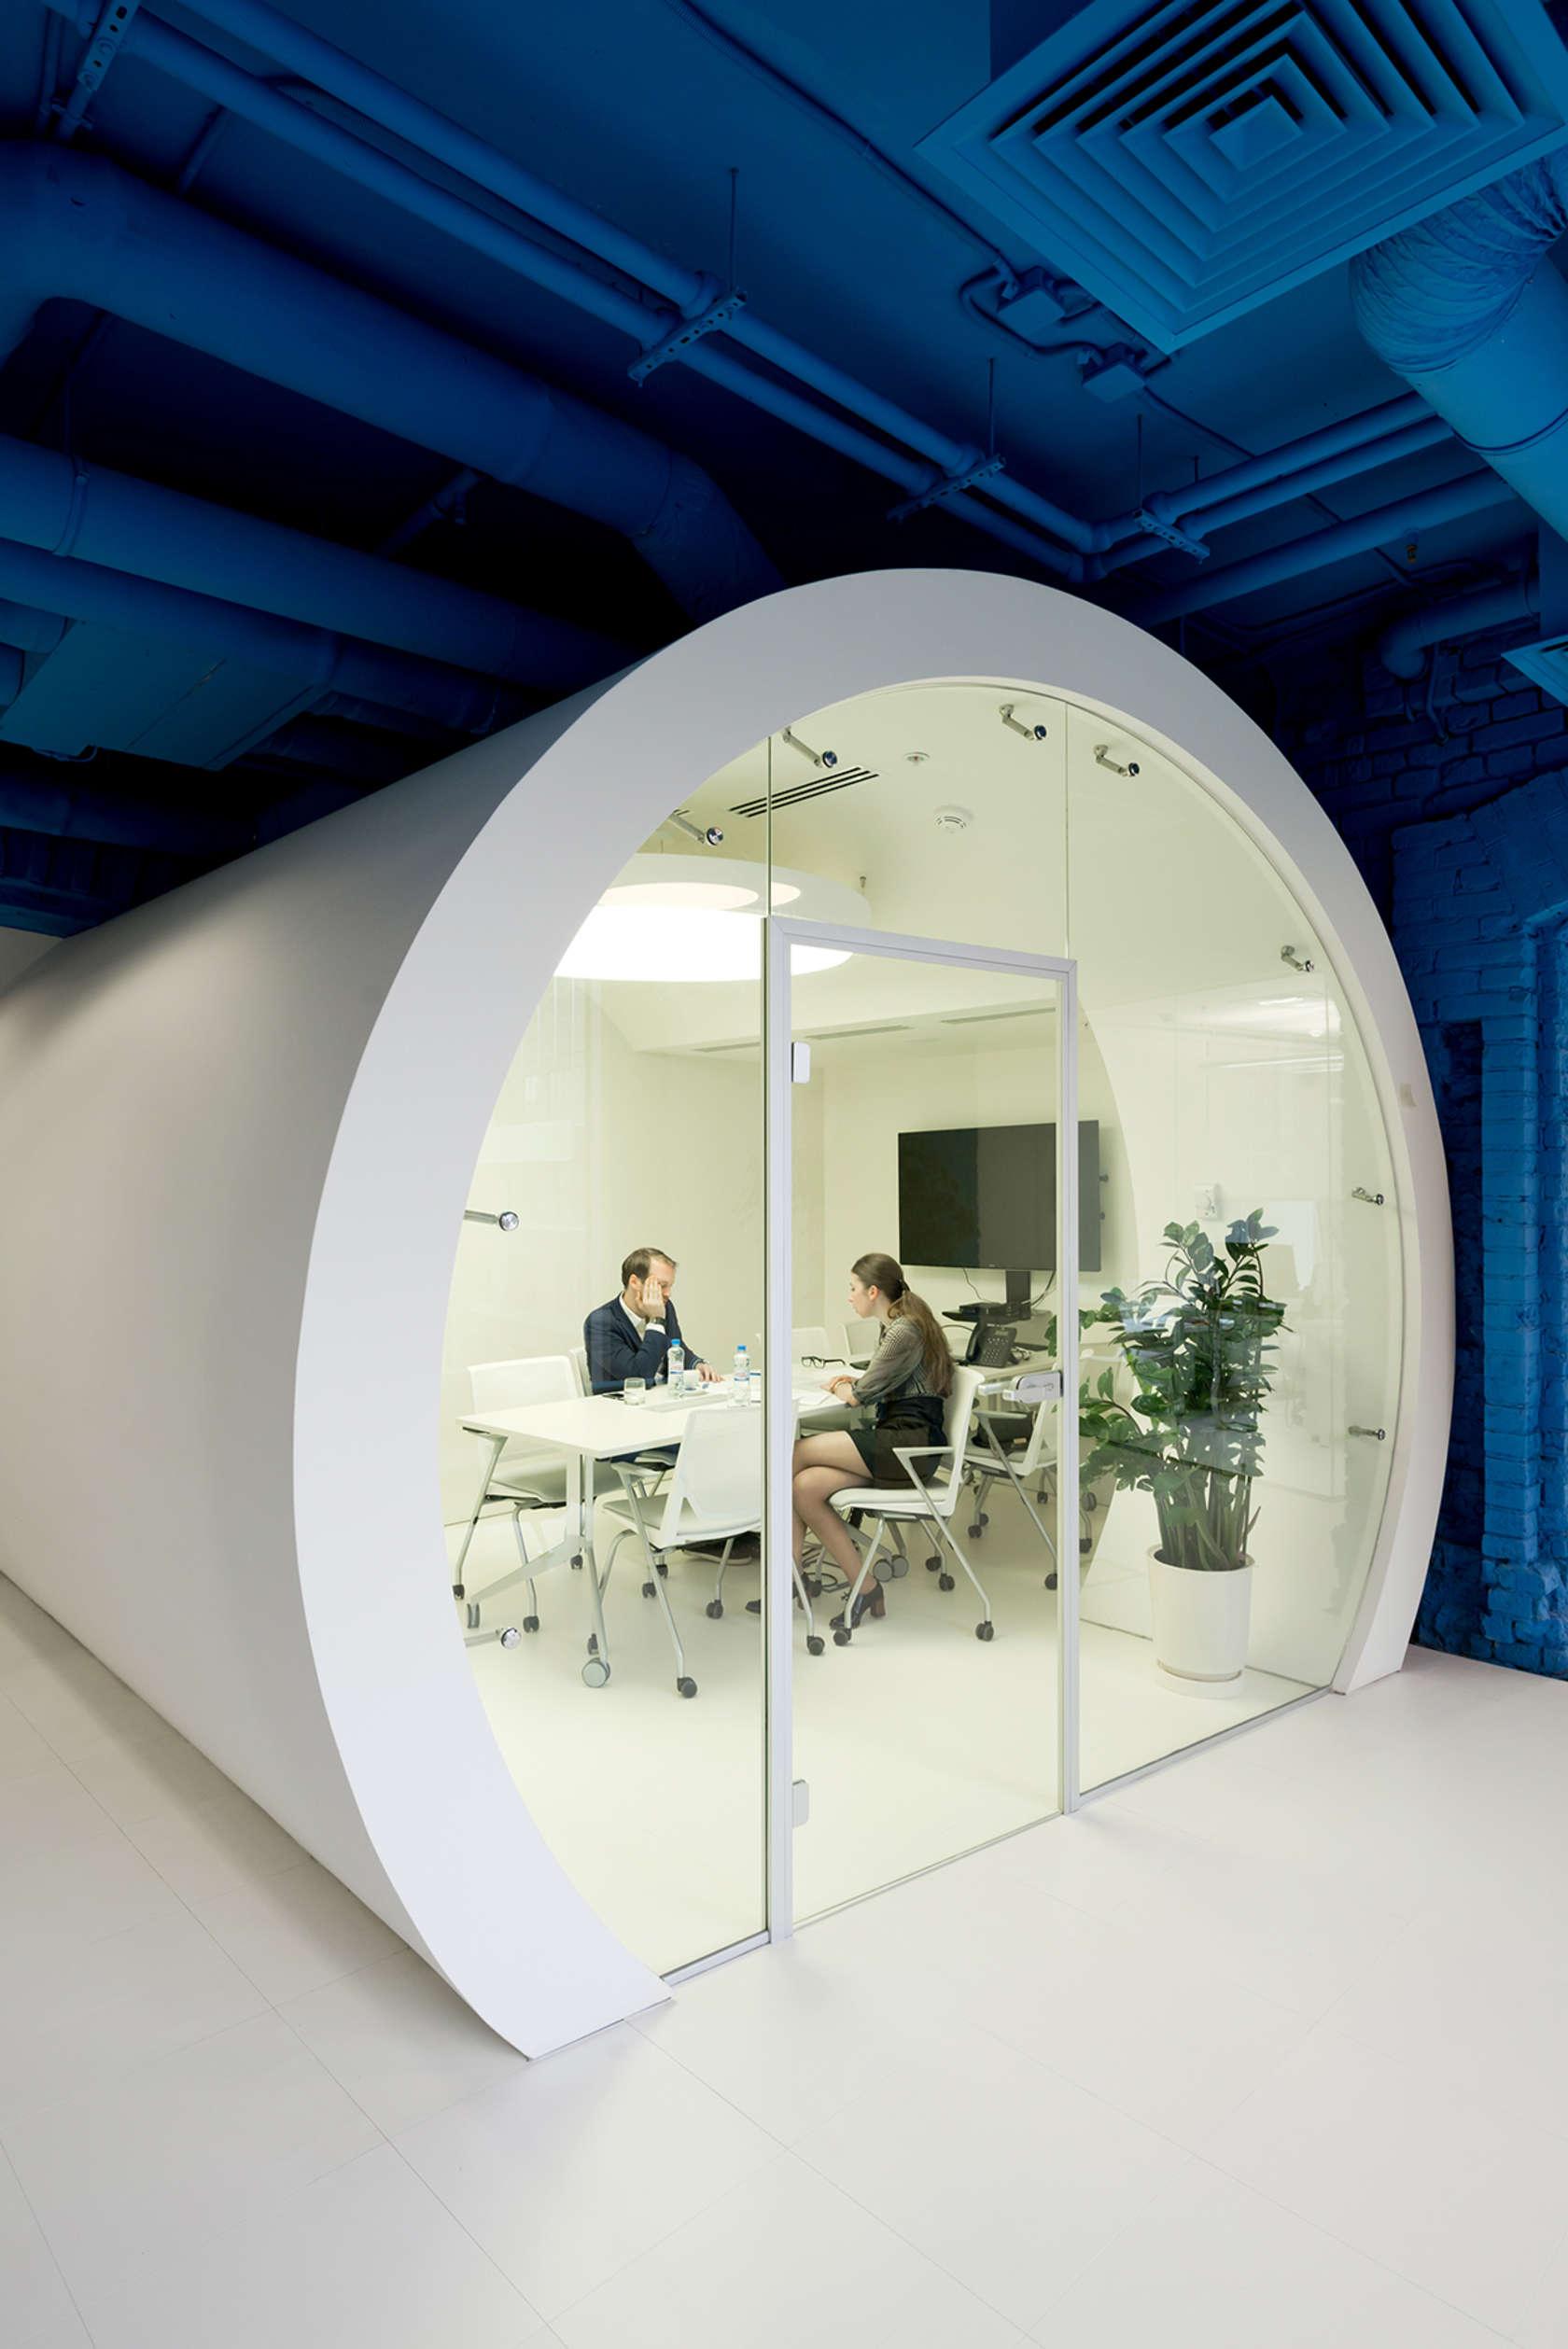 Nefa architects leo burnett Burnett Moscow Interior Design Google News Publicis Groupe Latest